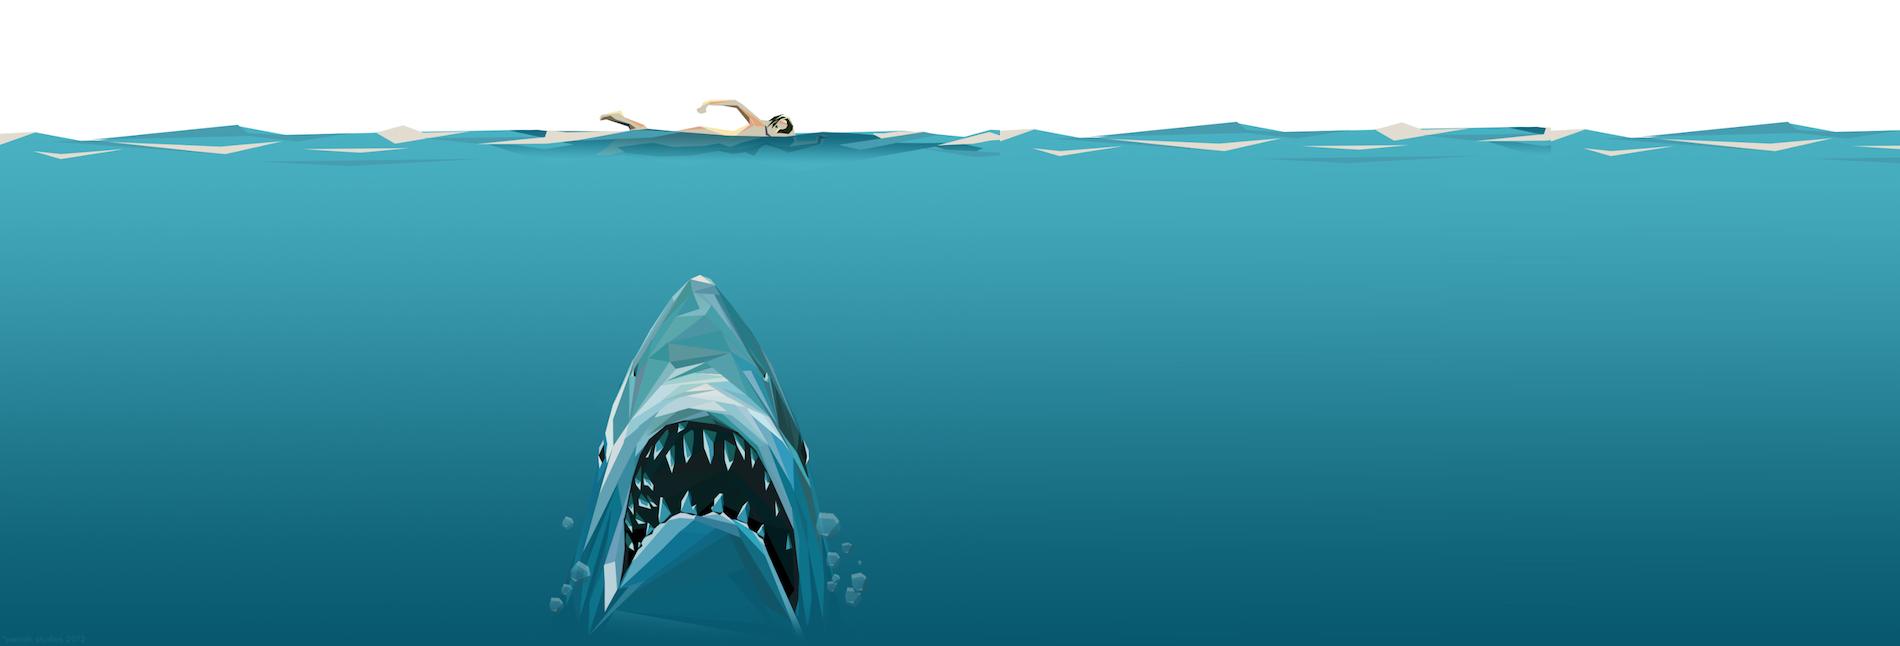 пловец иллюстрация